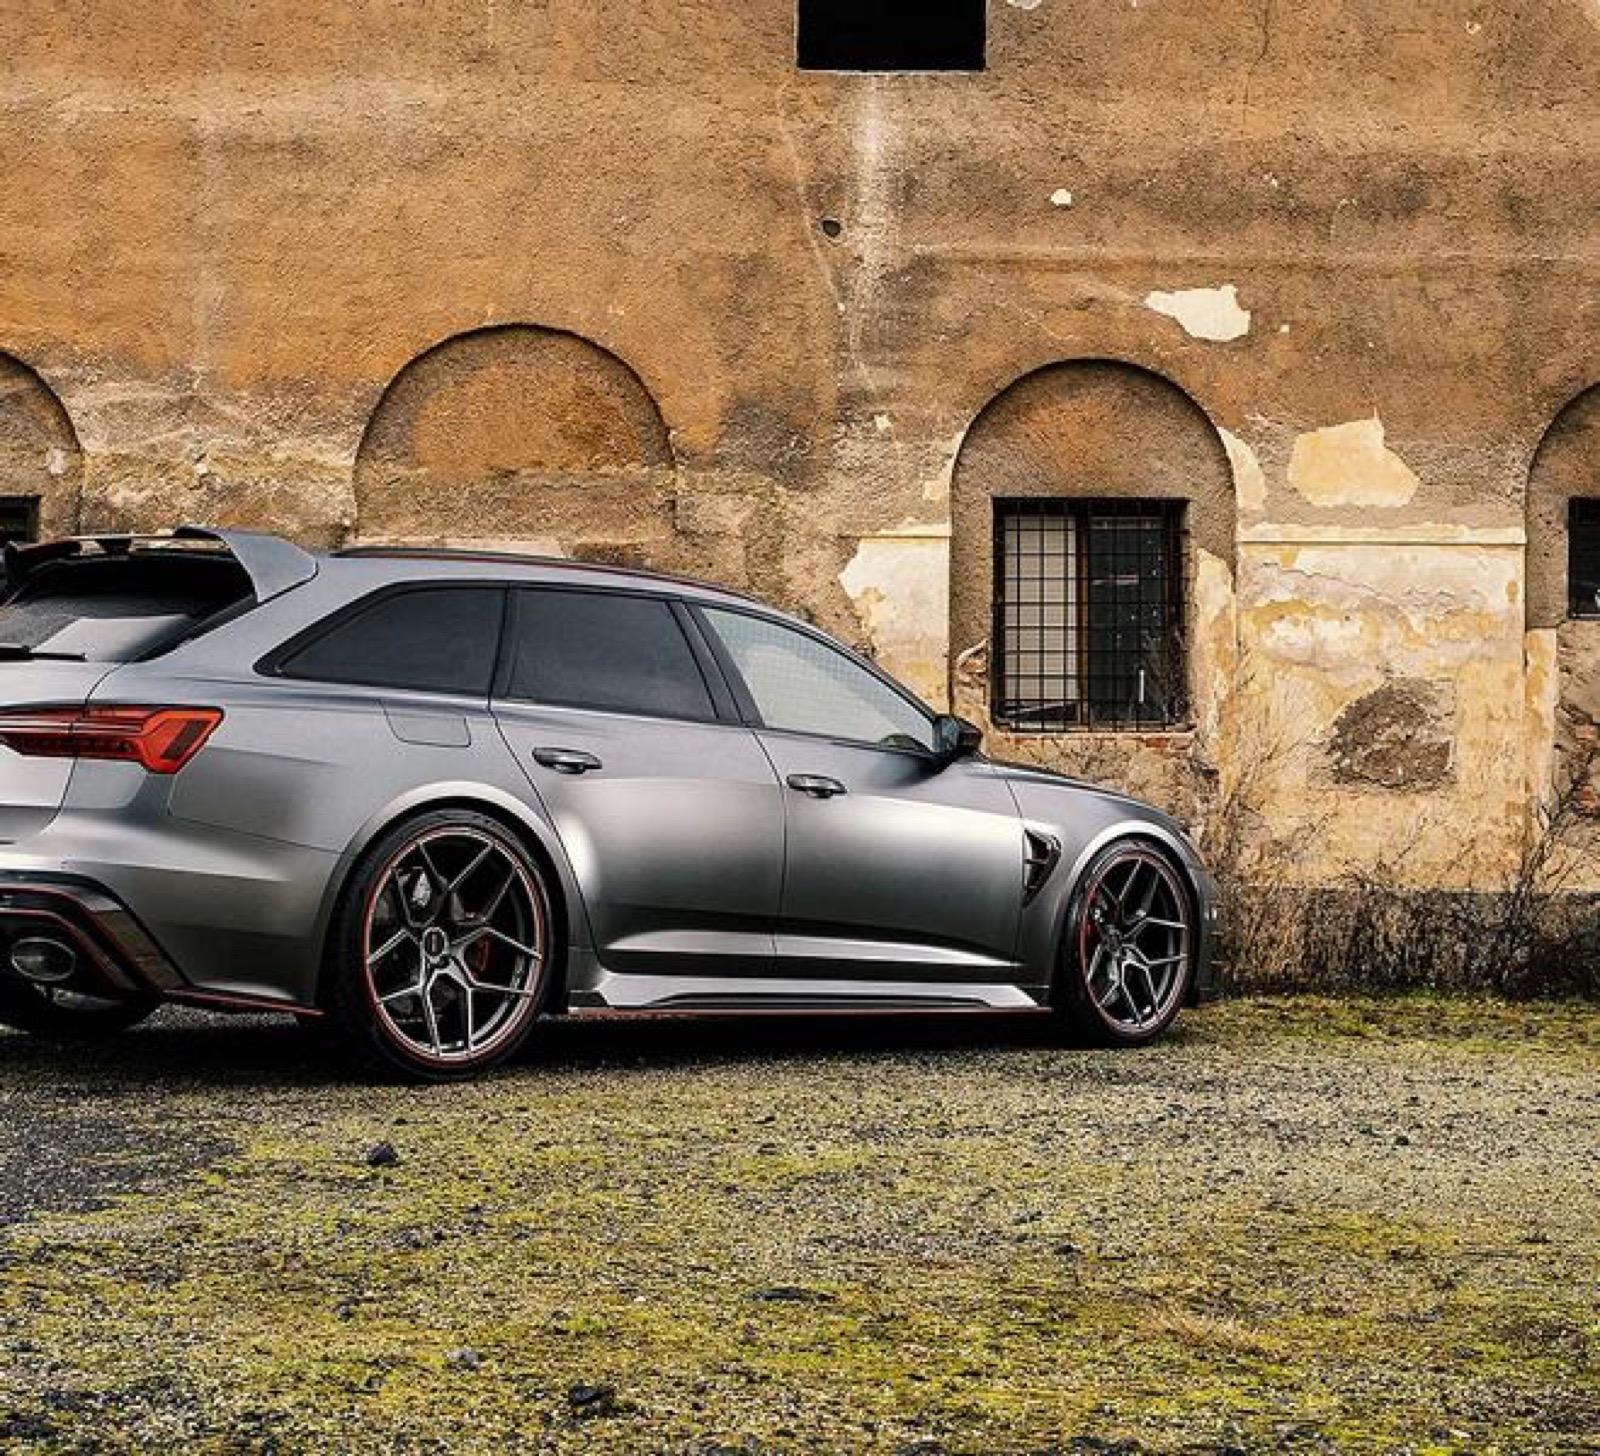 Audi-RS6-Avant-by-Keyvany-10